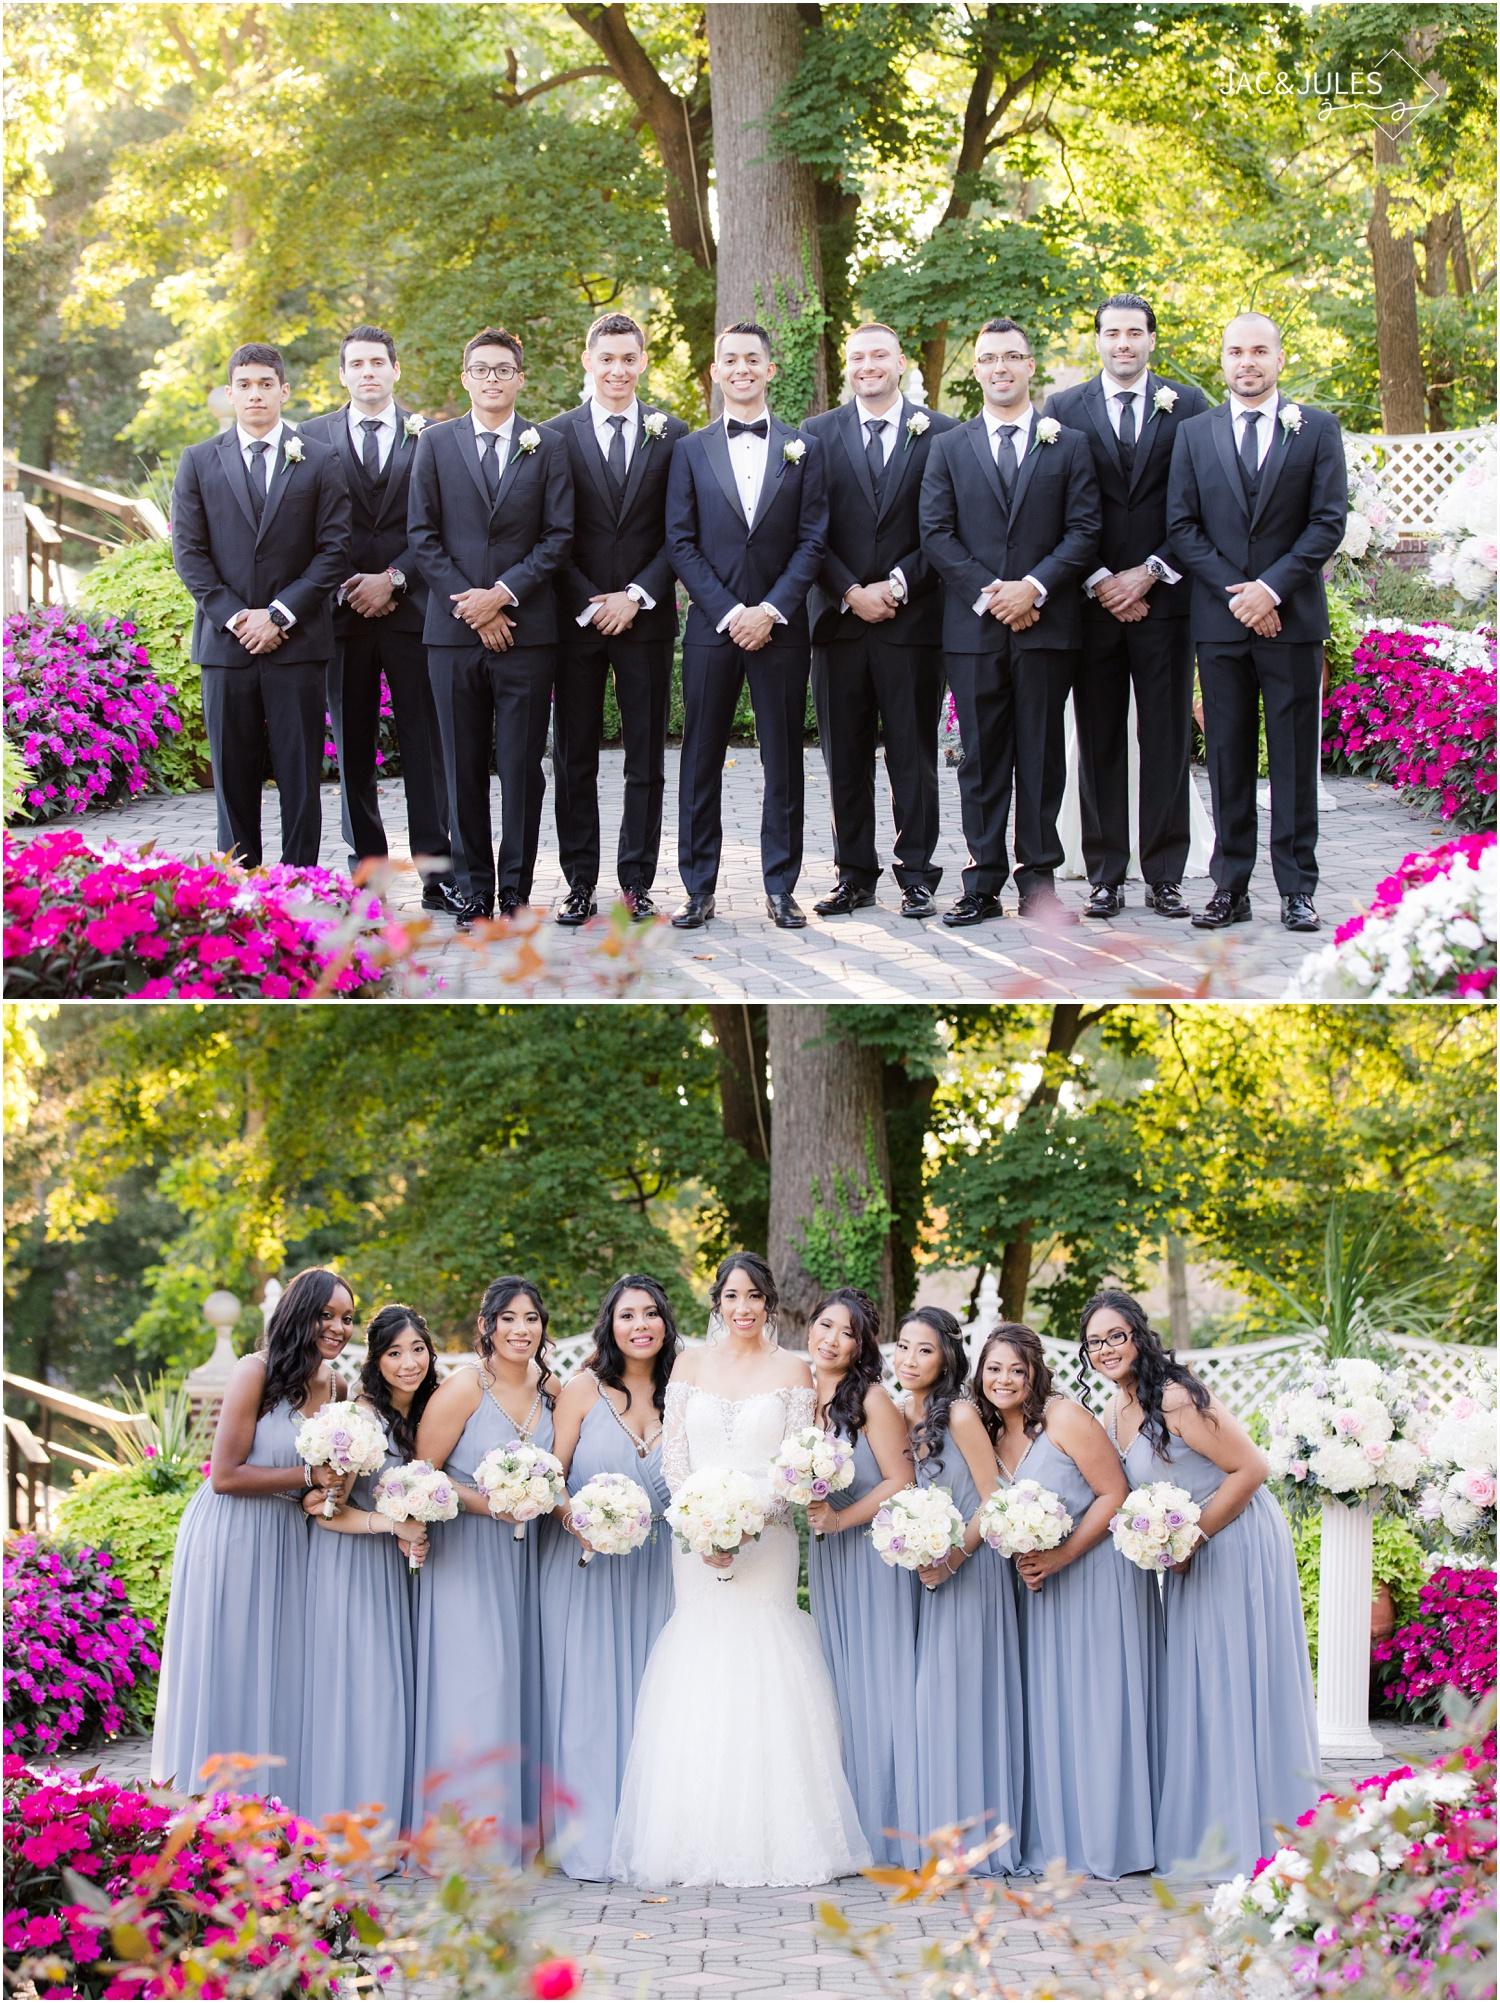 Bridesmaids and groomsmen photos at The Shadowbrook in Shrewsbury, NJ.